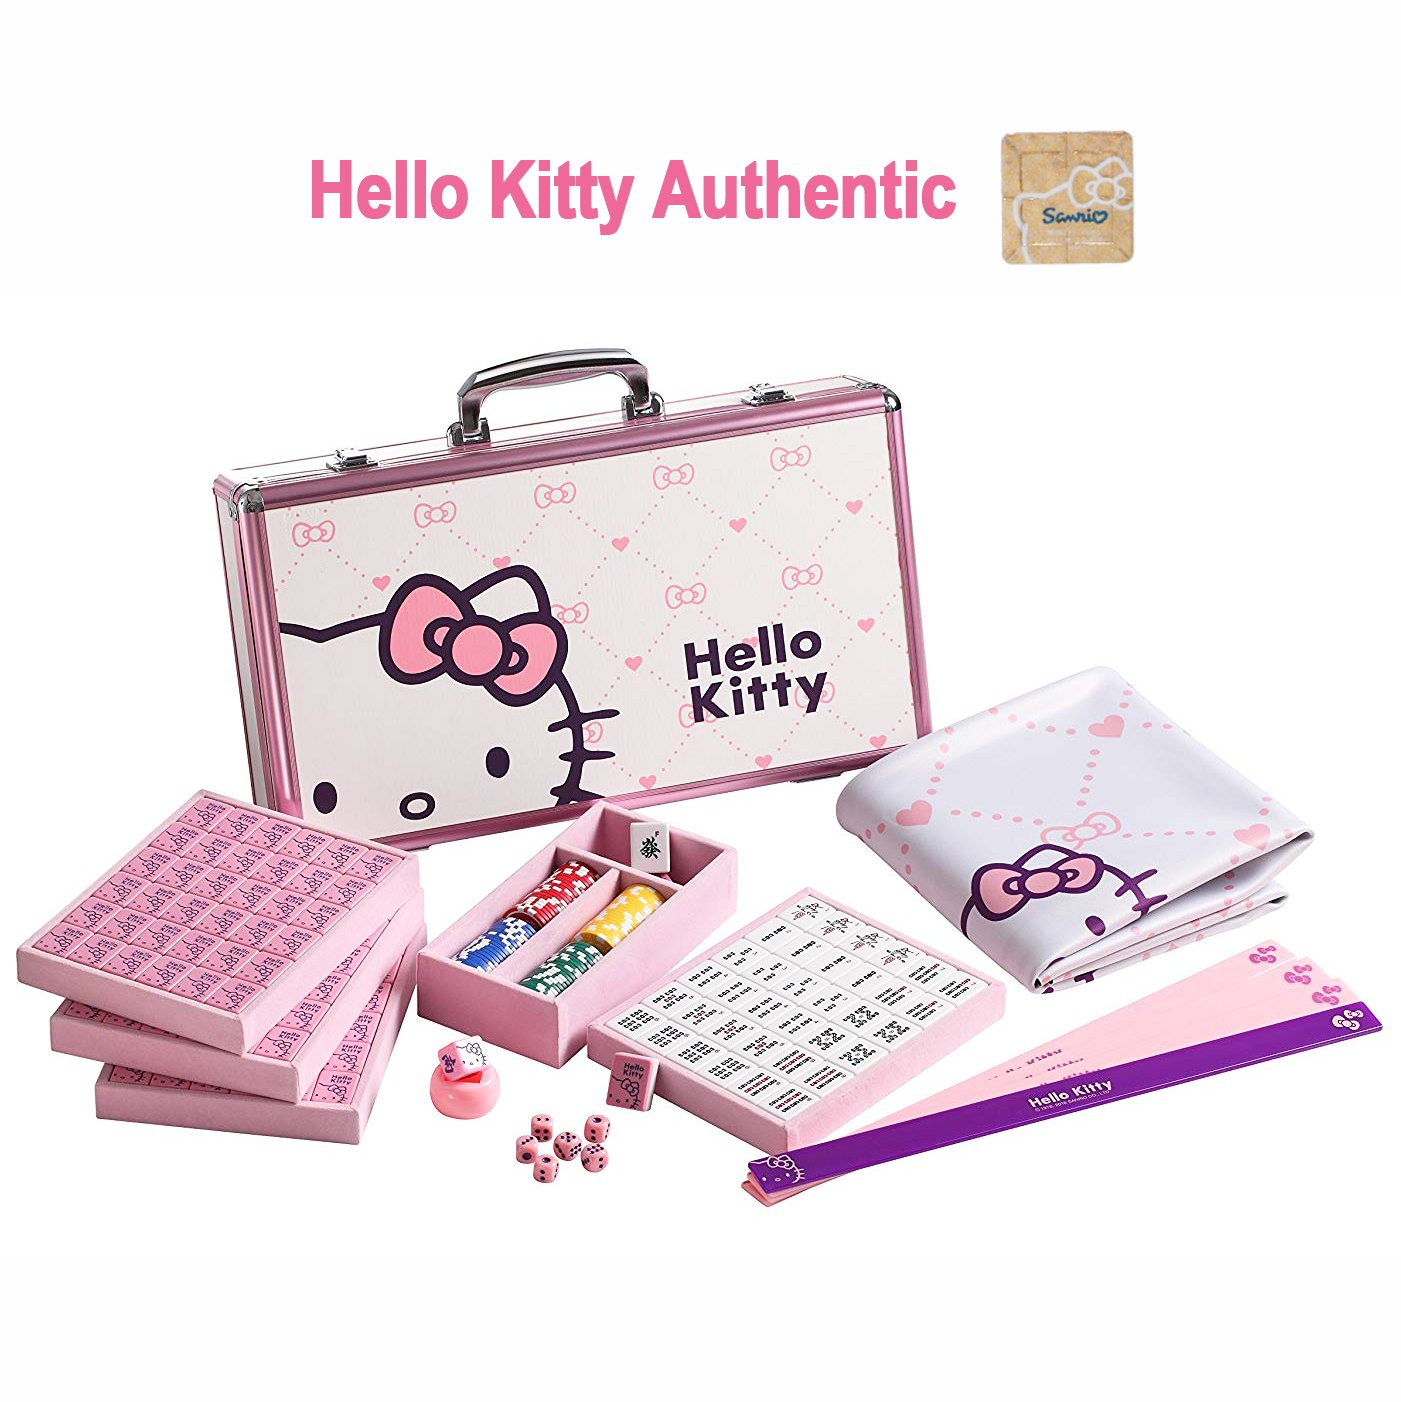 Hello Kitty Sanrio ハローキティ 144 Tiles Playing Mat 4 Pushers Pink Aluminum Complete Mahjong Set